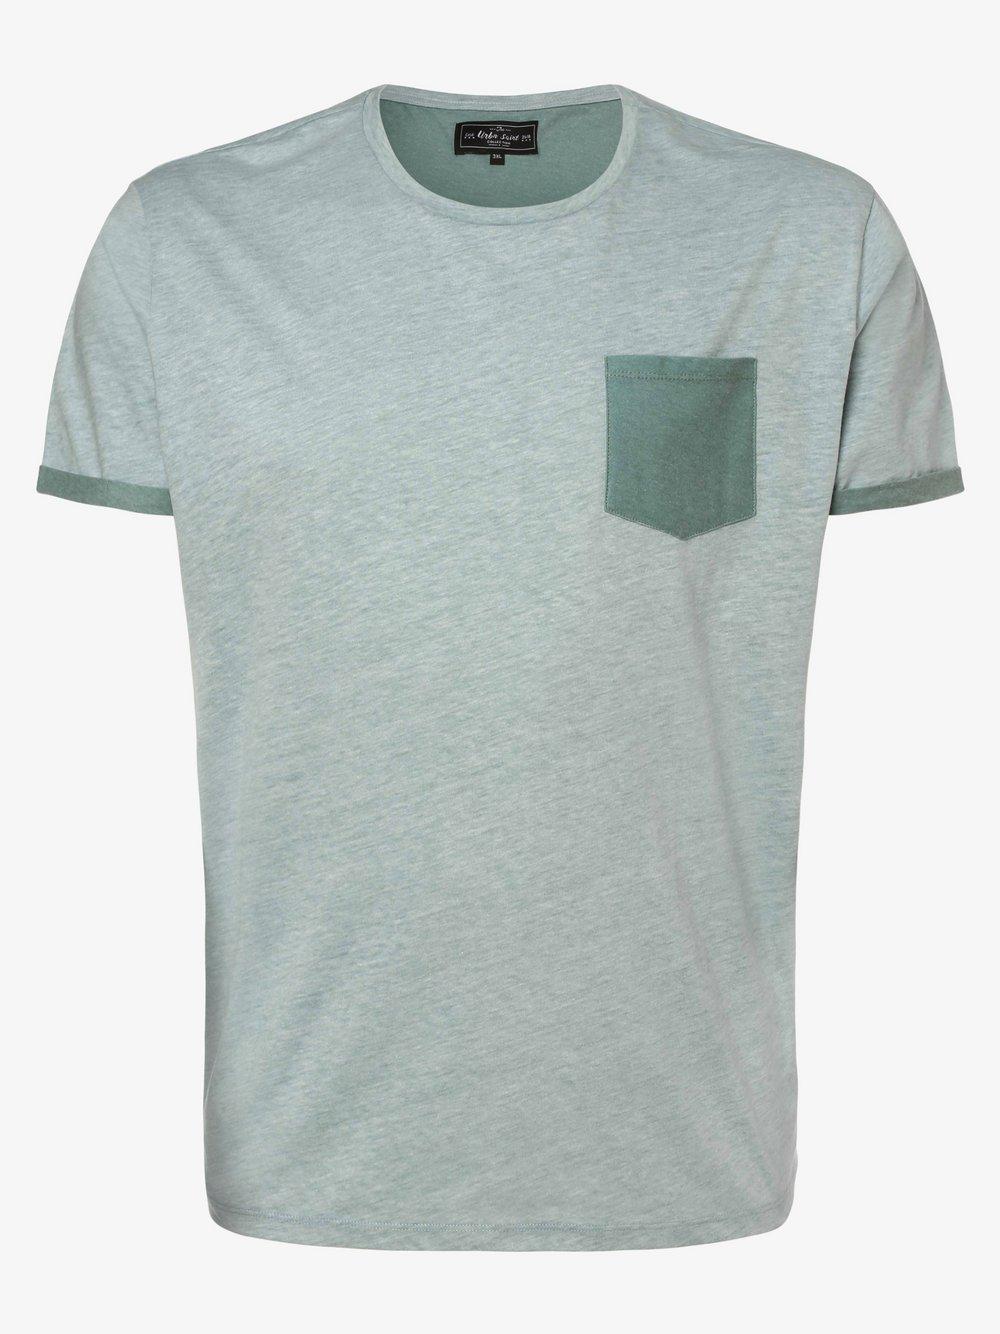 URBN SAINT – T-shirt męski – USSUN, zielony Van Graaf 469728-0001-09987